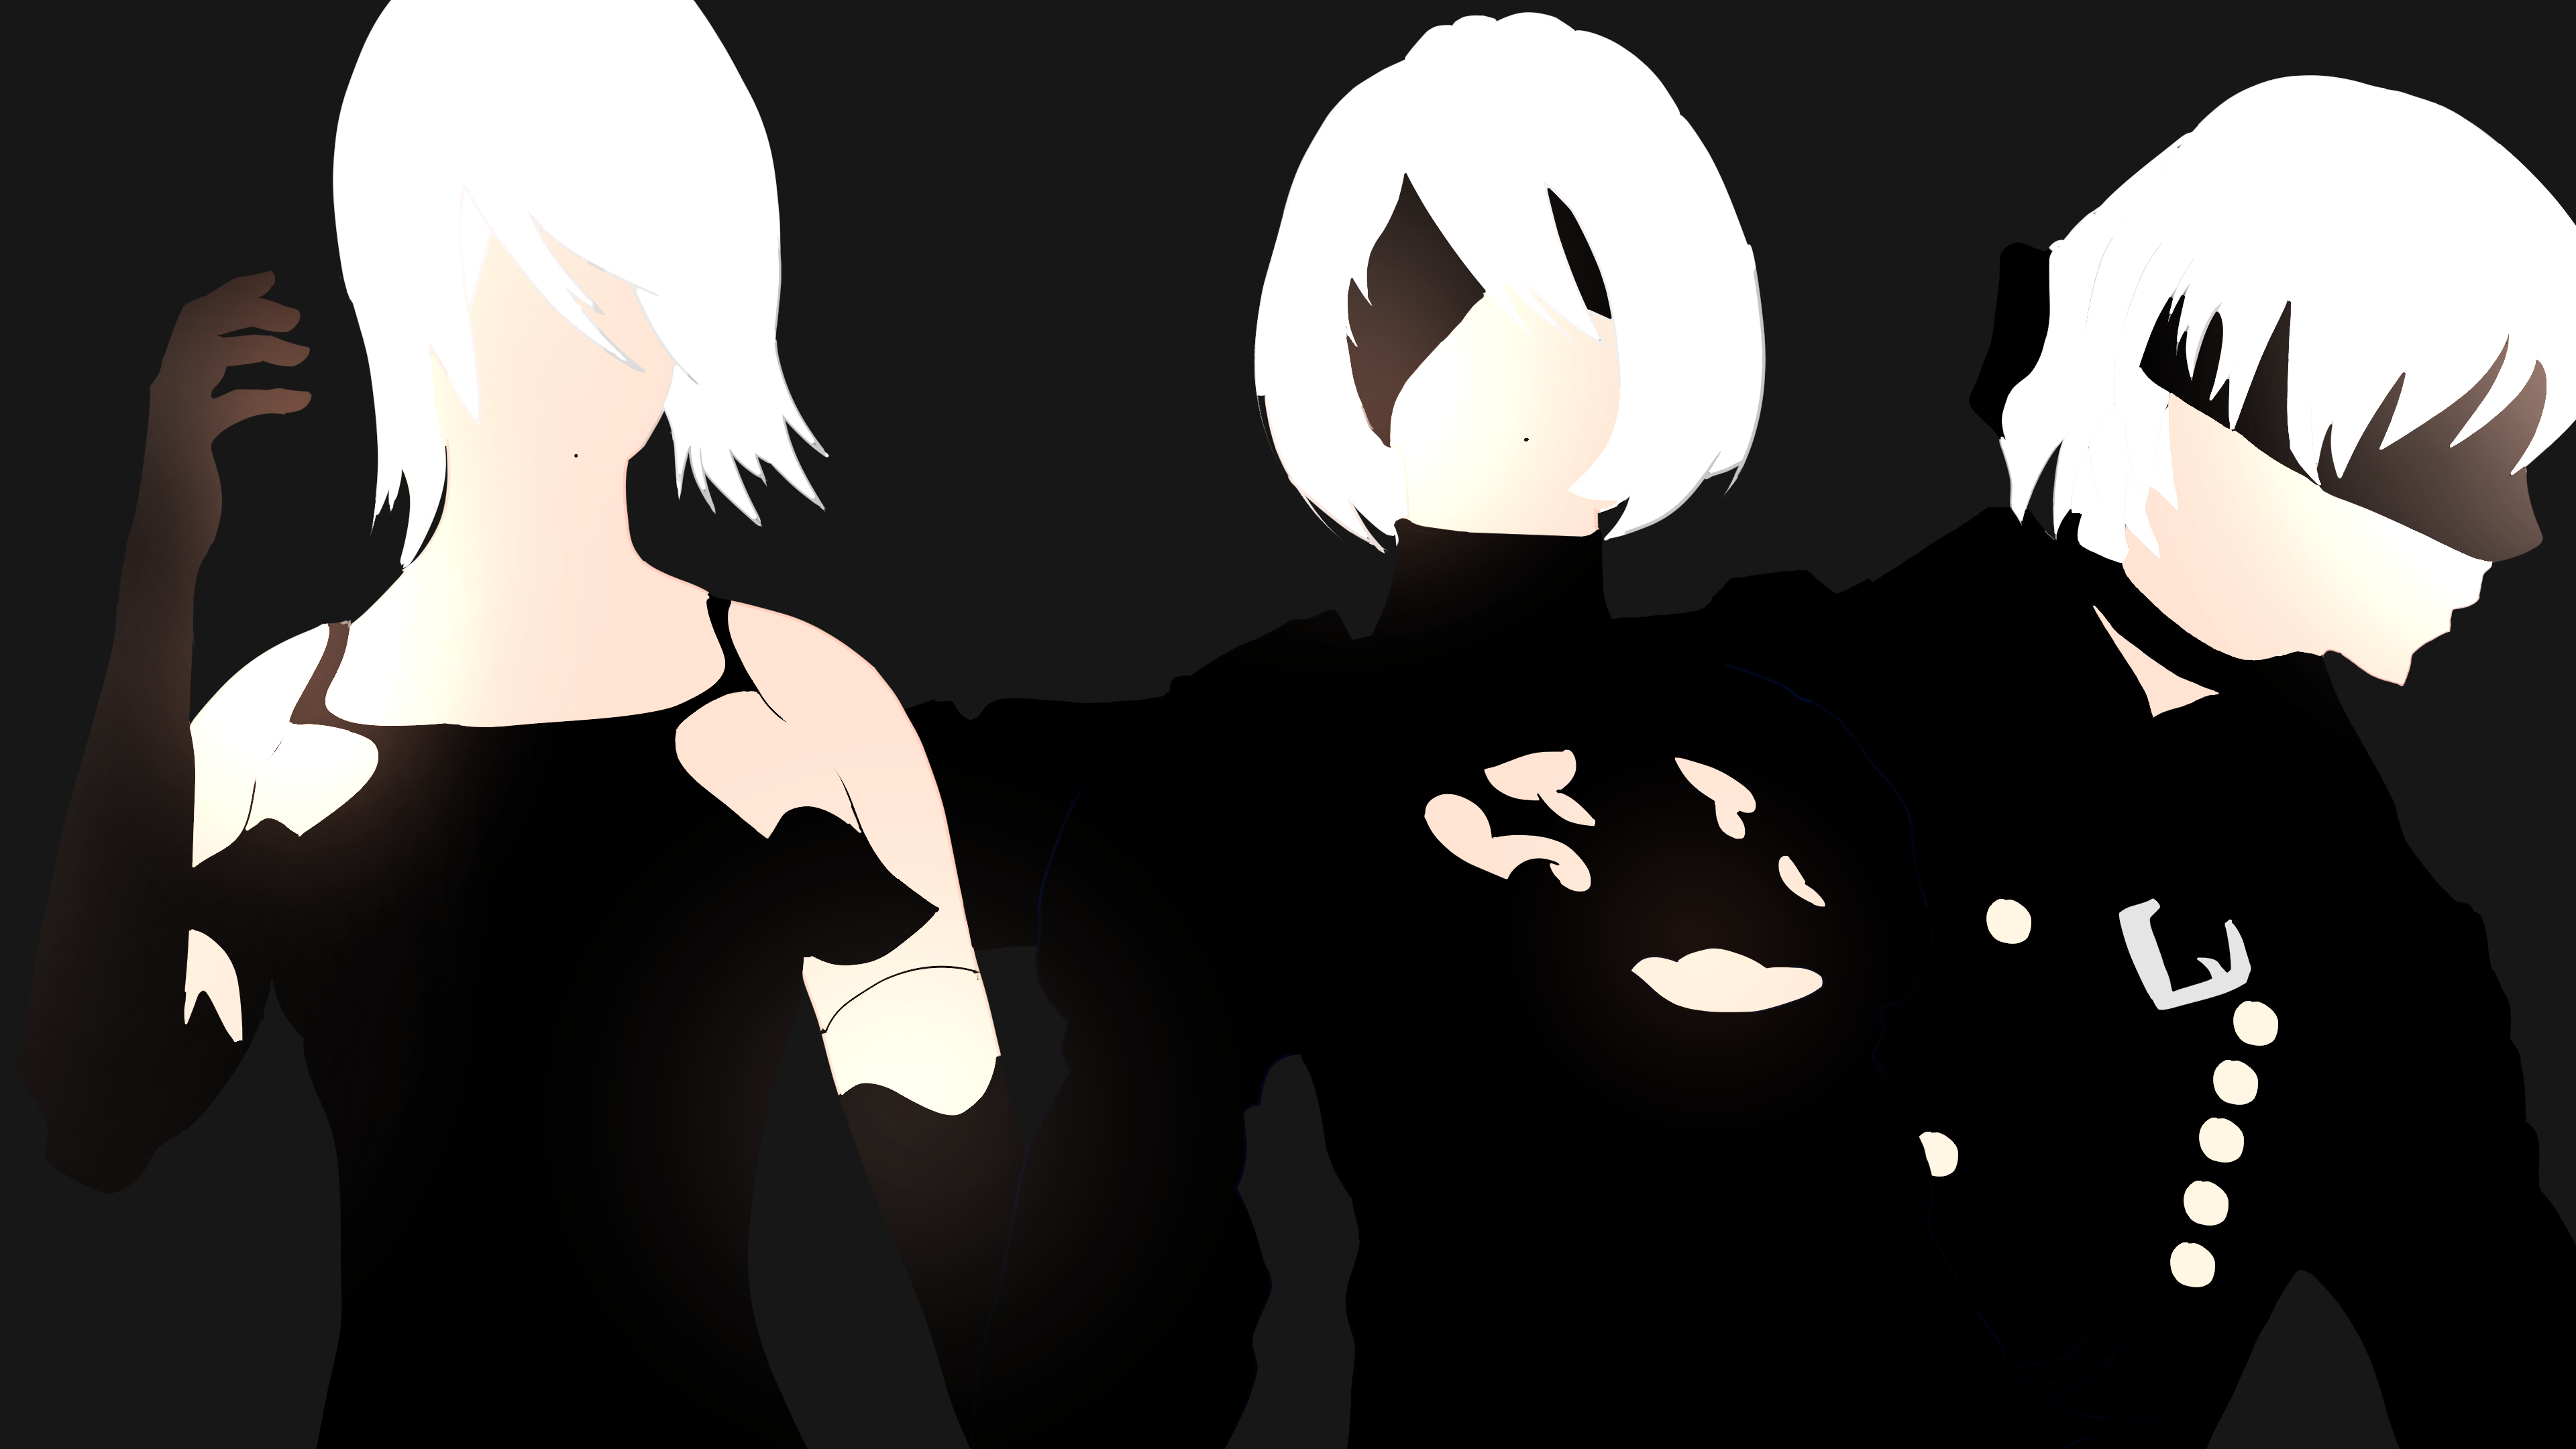 Anime 3840x2160 Nier: Automata 2B (Nier: Automata) 9S (Nier: Automata) A2 (Nier: Automata) minimalism video games